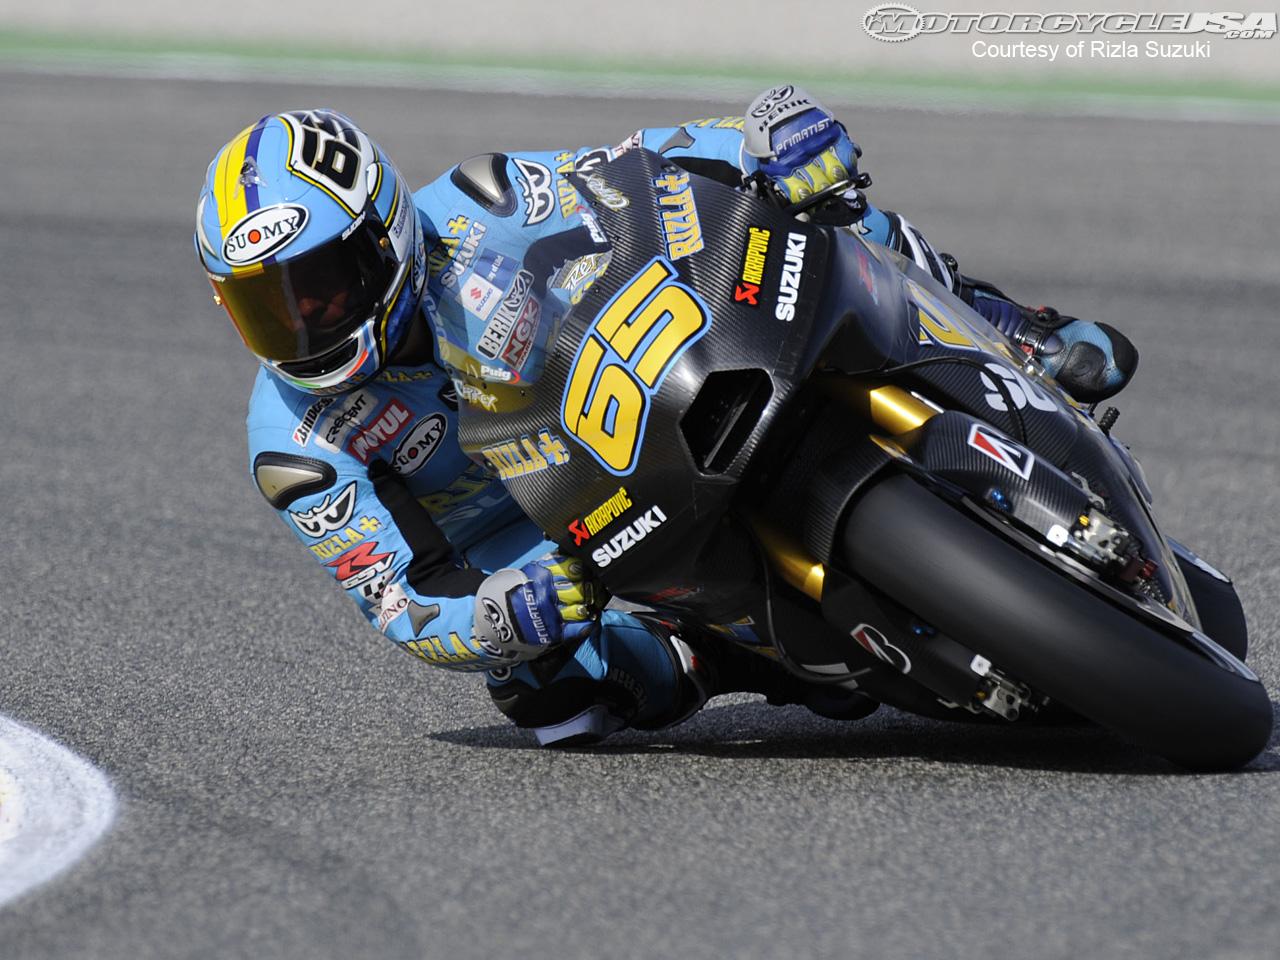 Download HQ MotoGP MotoGP Wallpaper Num 7 1280 x 960 4028 Kb 1280x960